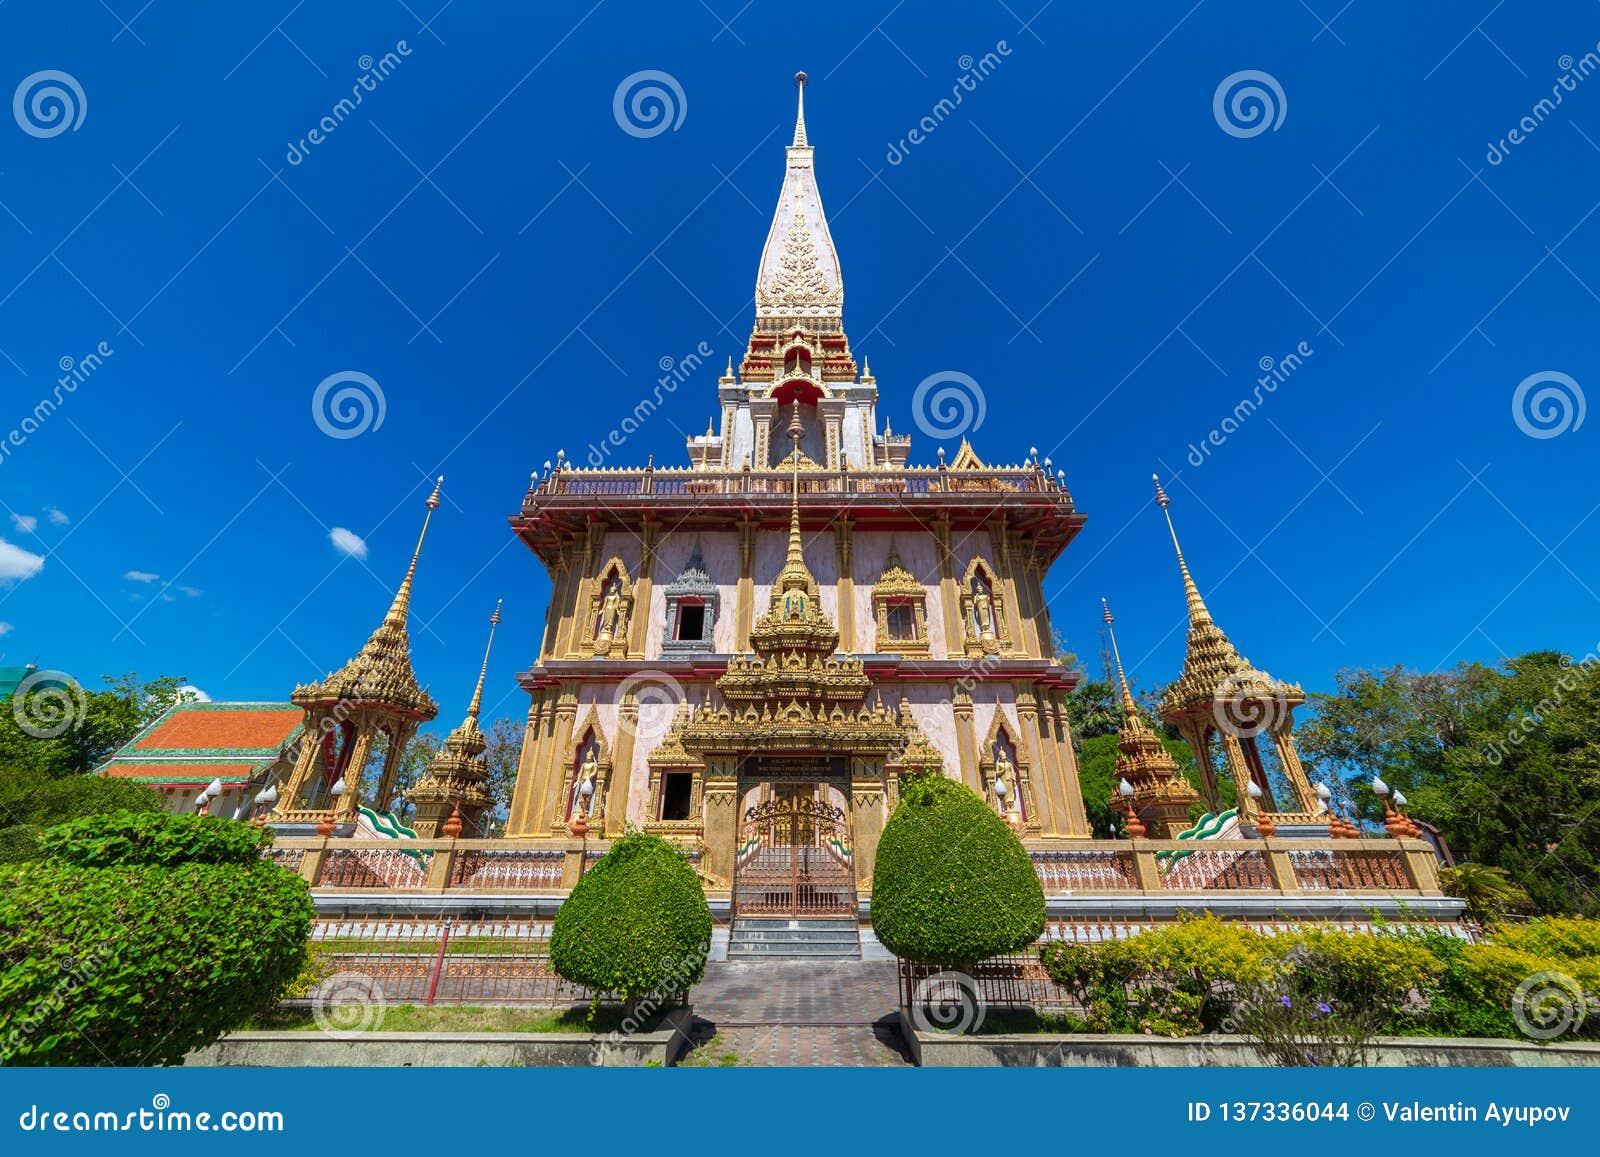 El templo de Wat Chalong Buddhist en Chalong, Phuket, Tailandia